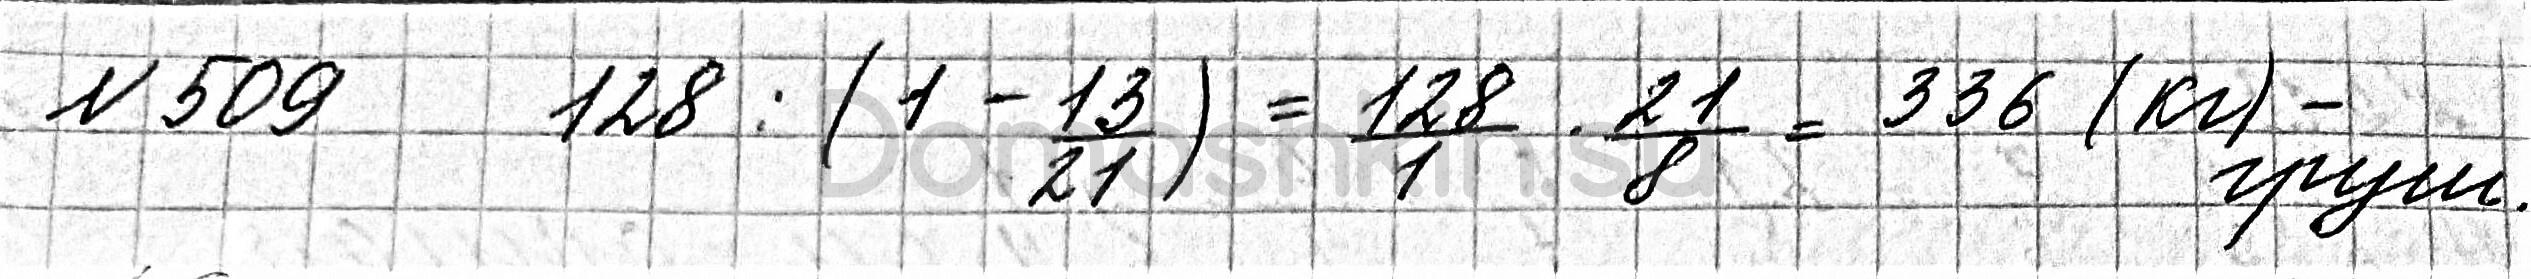 Математика 6 класс учебник Мерзляк номер 509 решение